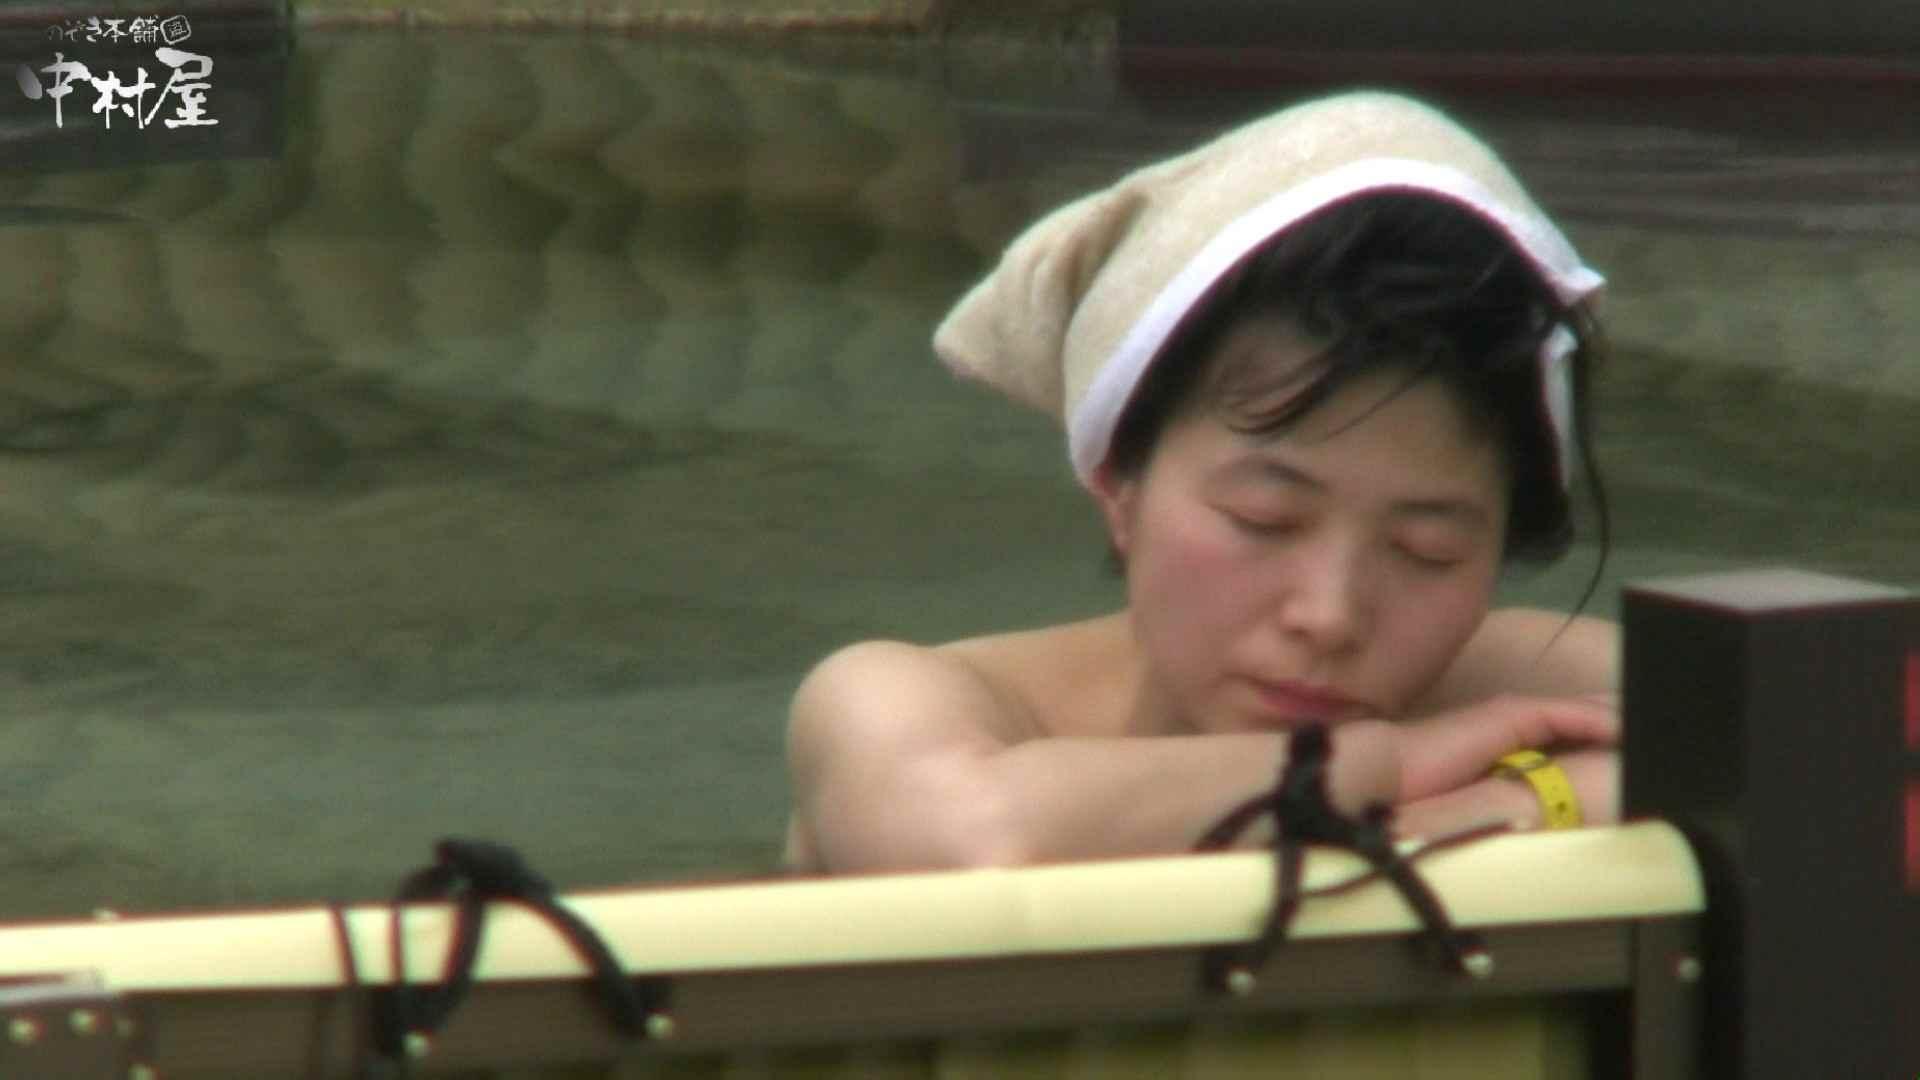 Aquaな露天風呂Vol.950 HなOL | 露天  53pic 7